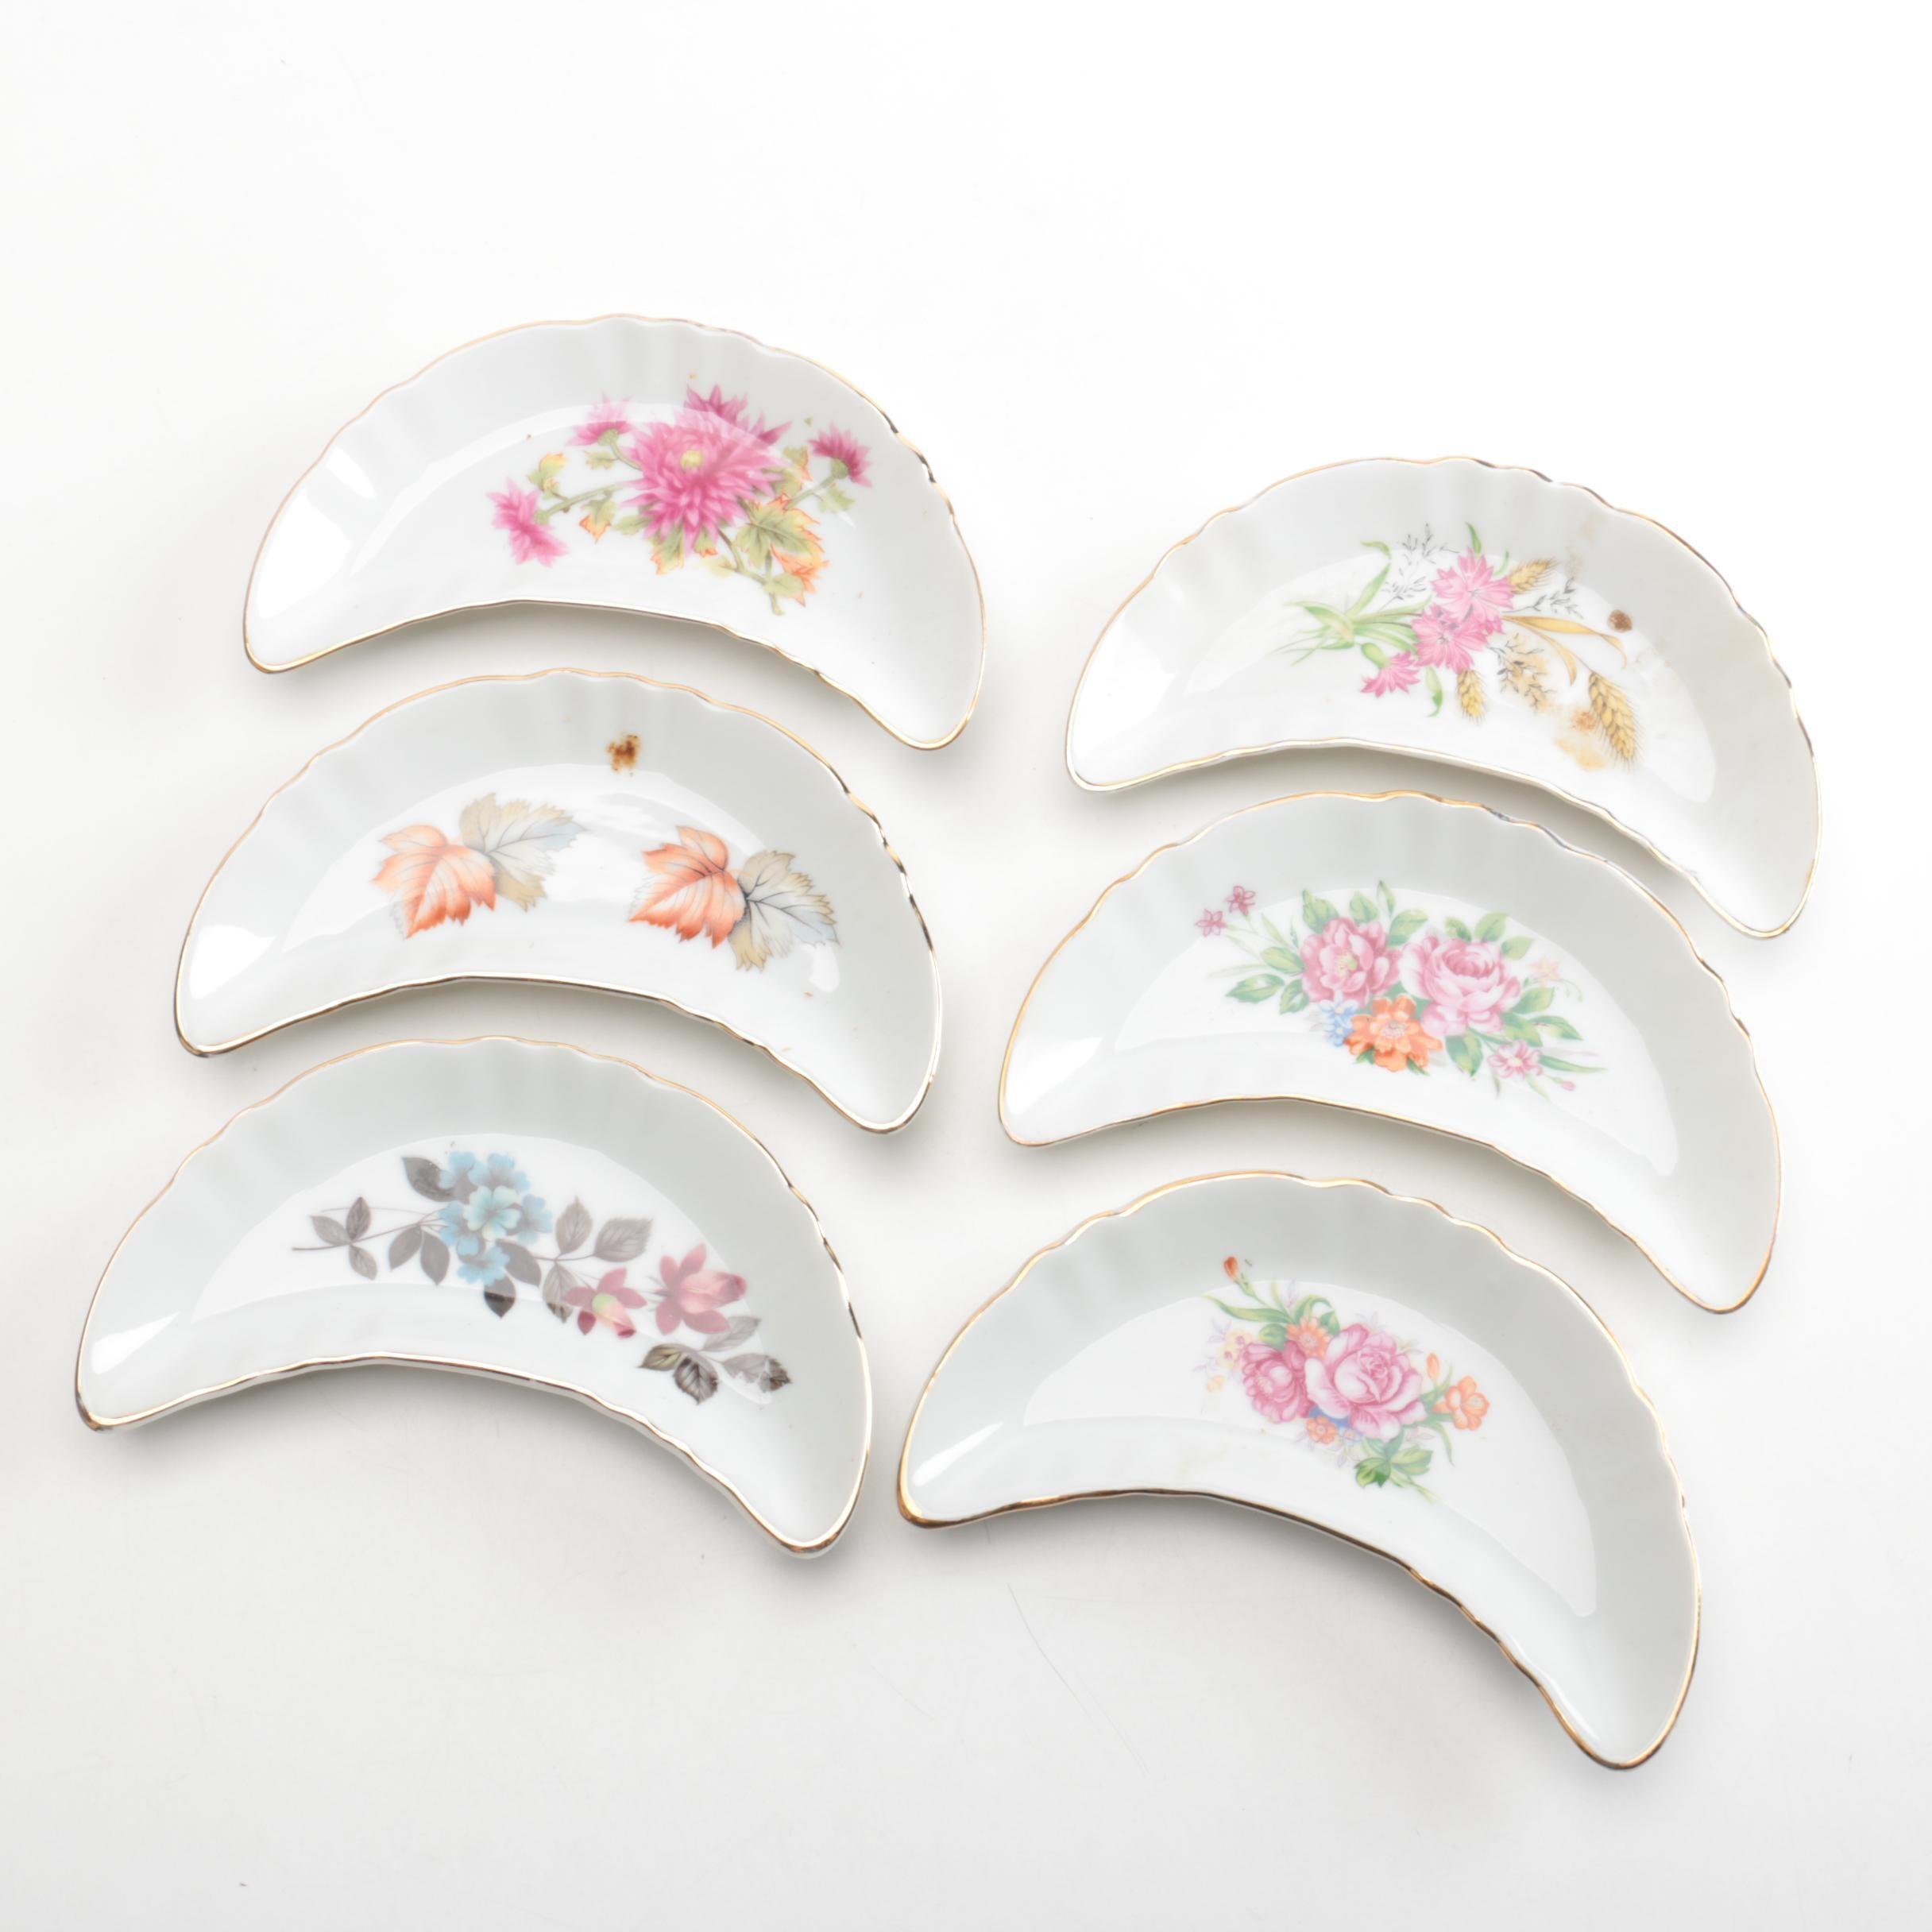 Vintage Chadwick Porcelain Tableware